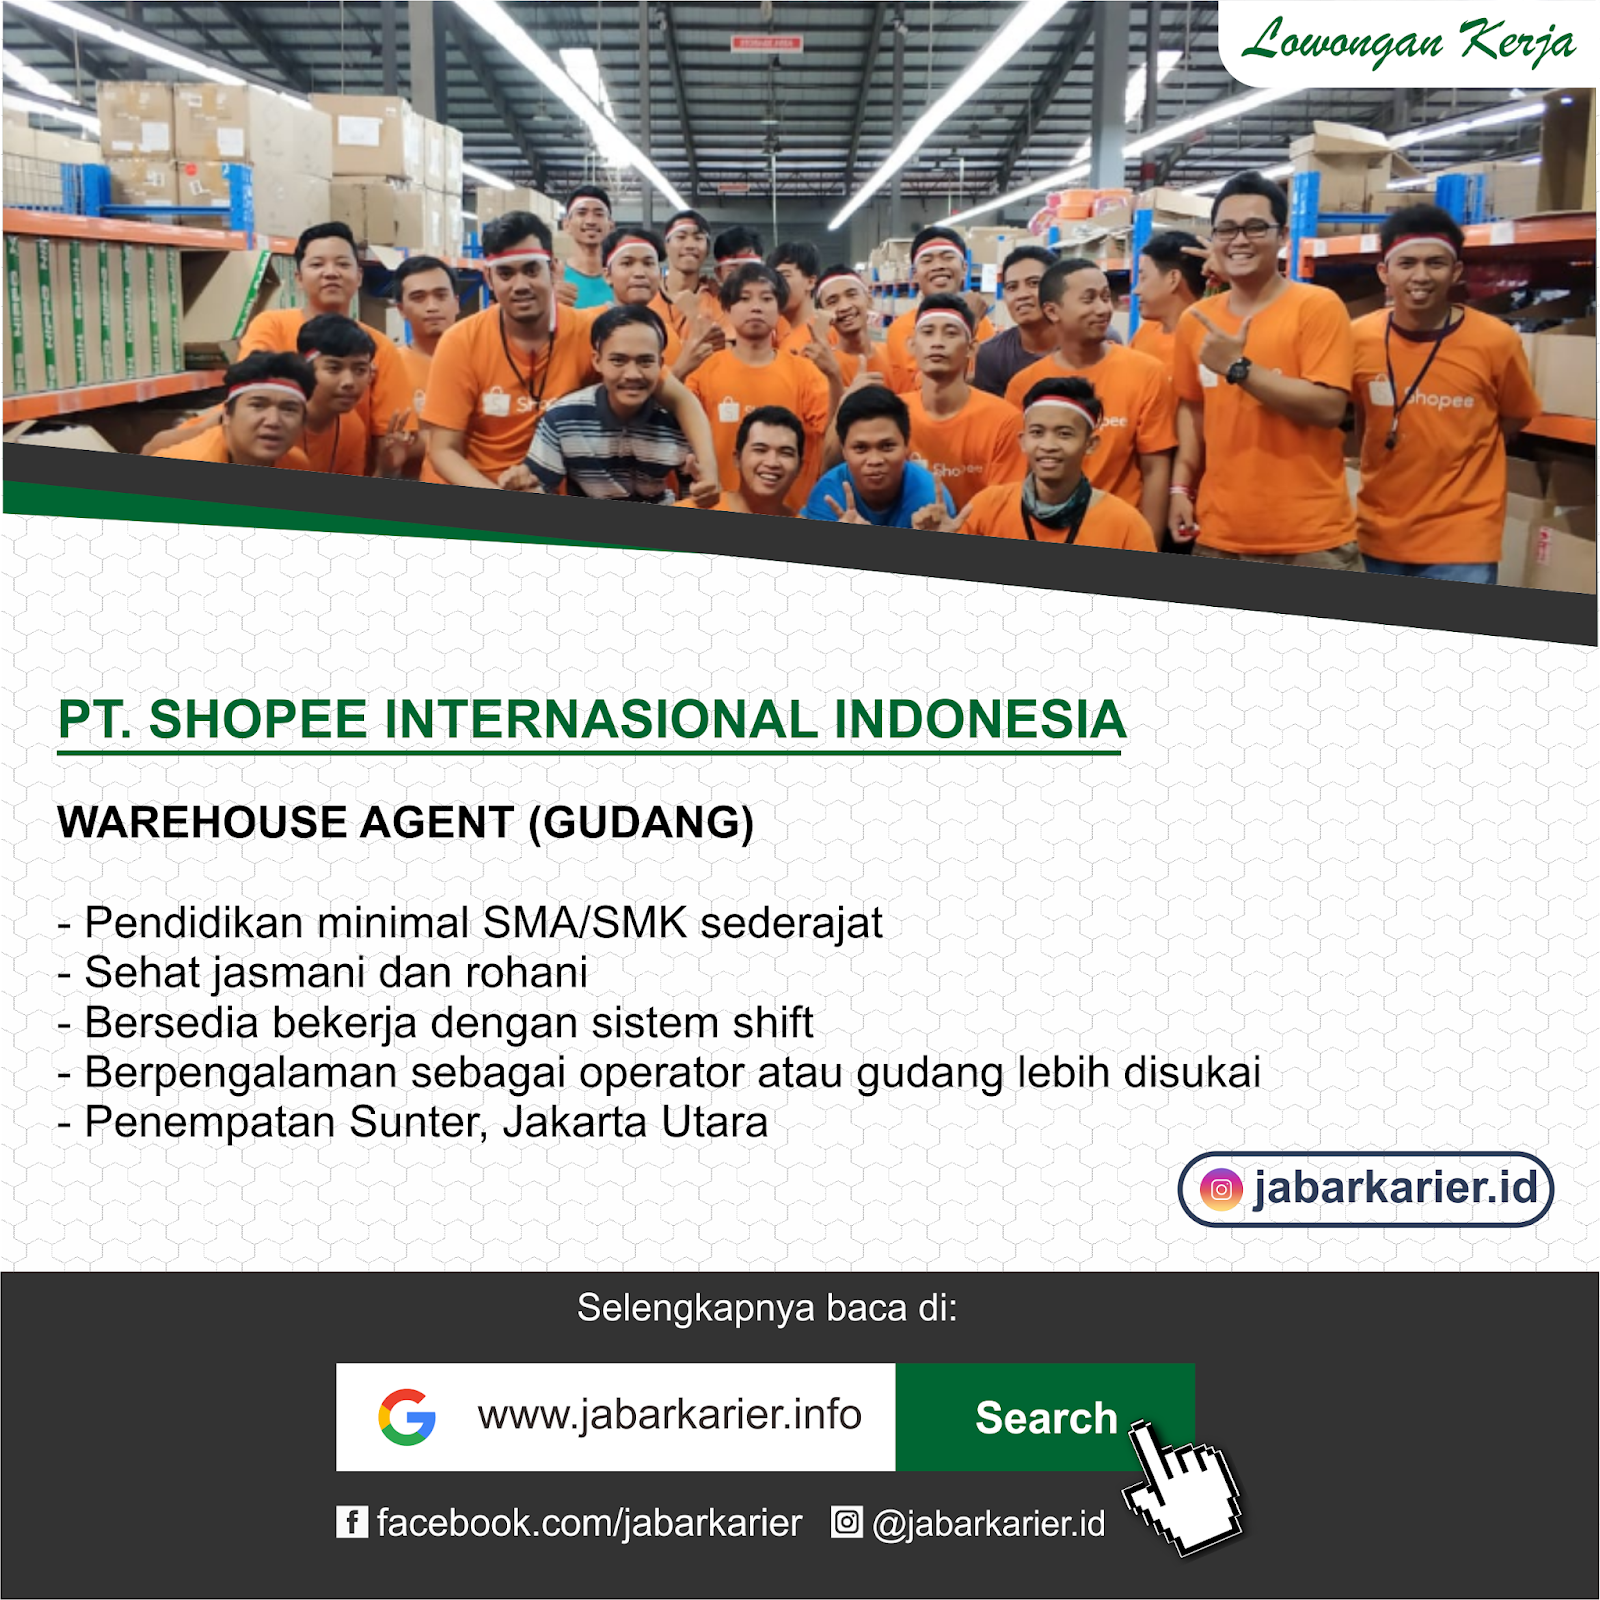 Loker Warehouse Agent Shopee Agustus 2019 Lowongan Kerja Terbaru Tahun 2020 Informasi Rekrutmen Cpns Pppk 2020